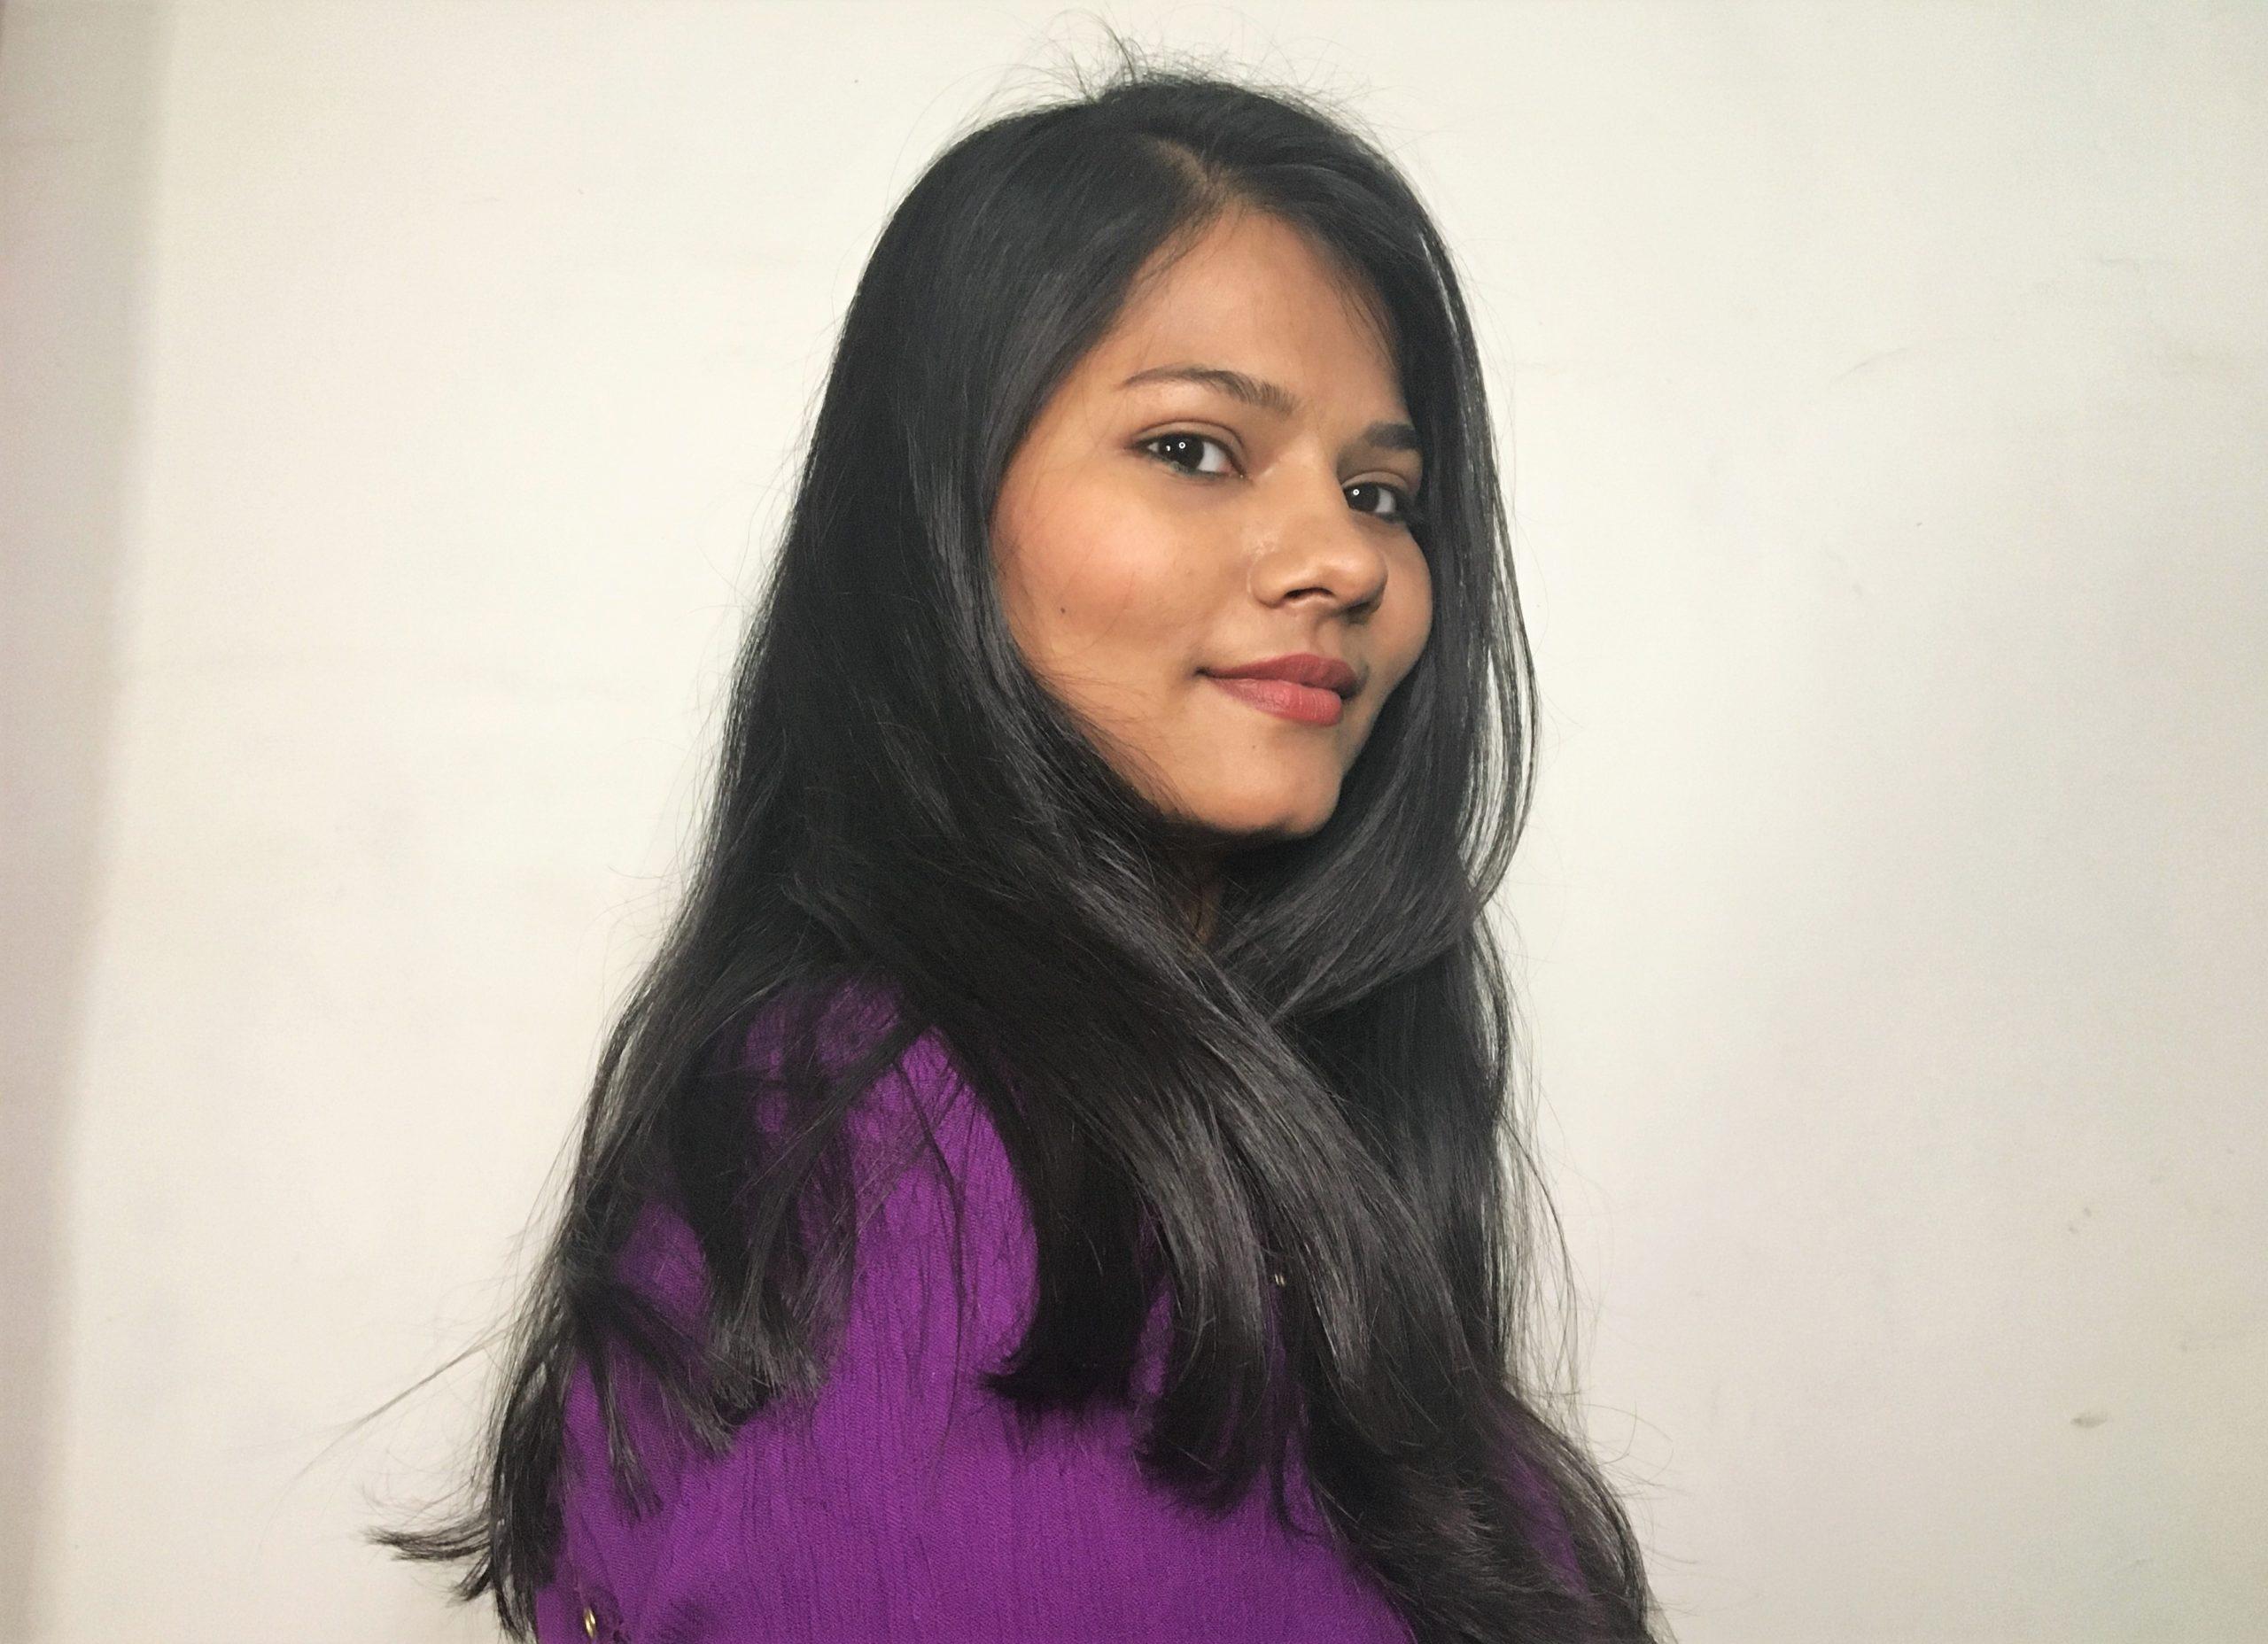 Mariyam Abid